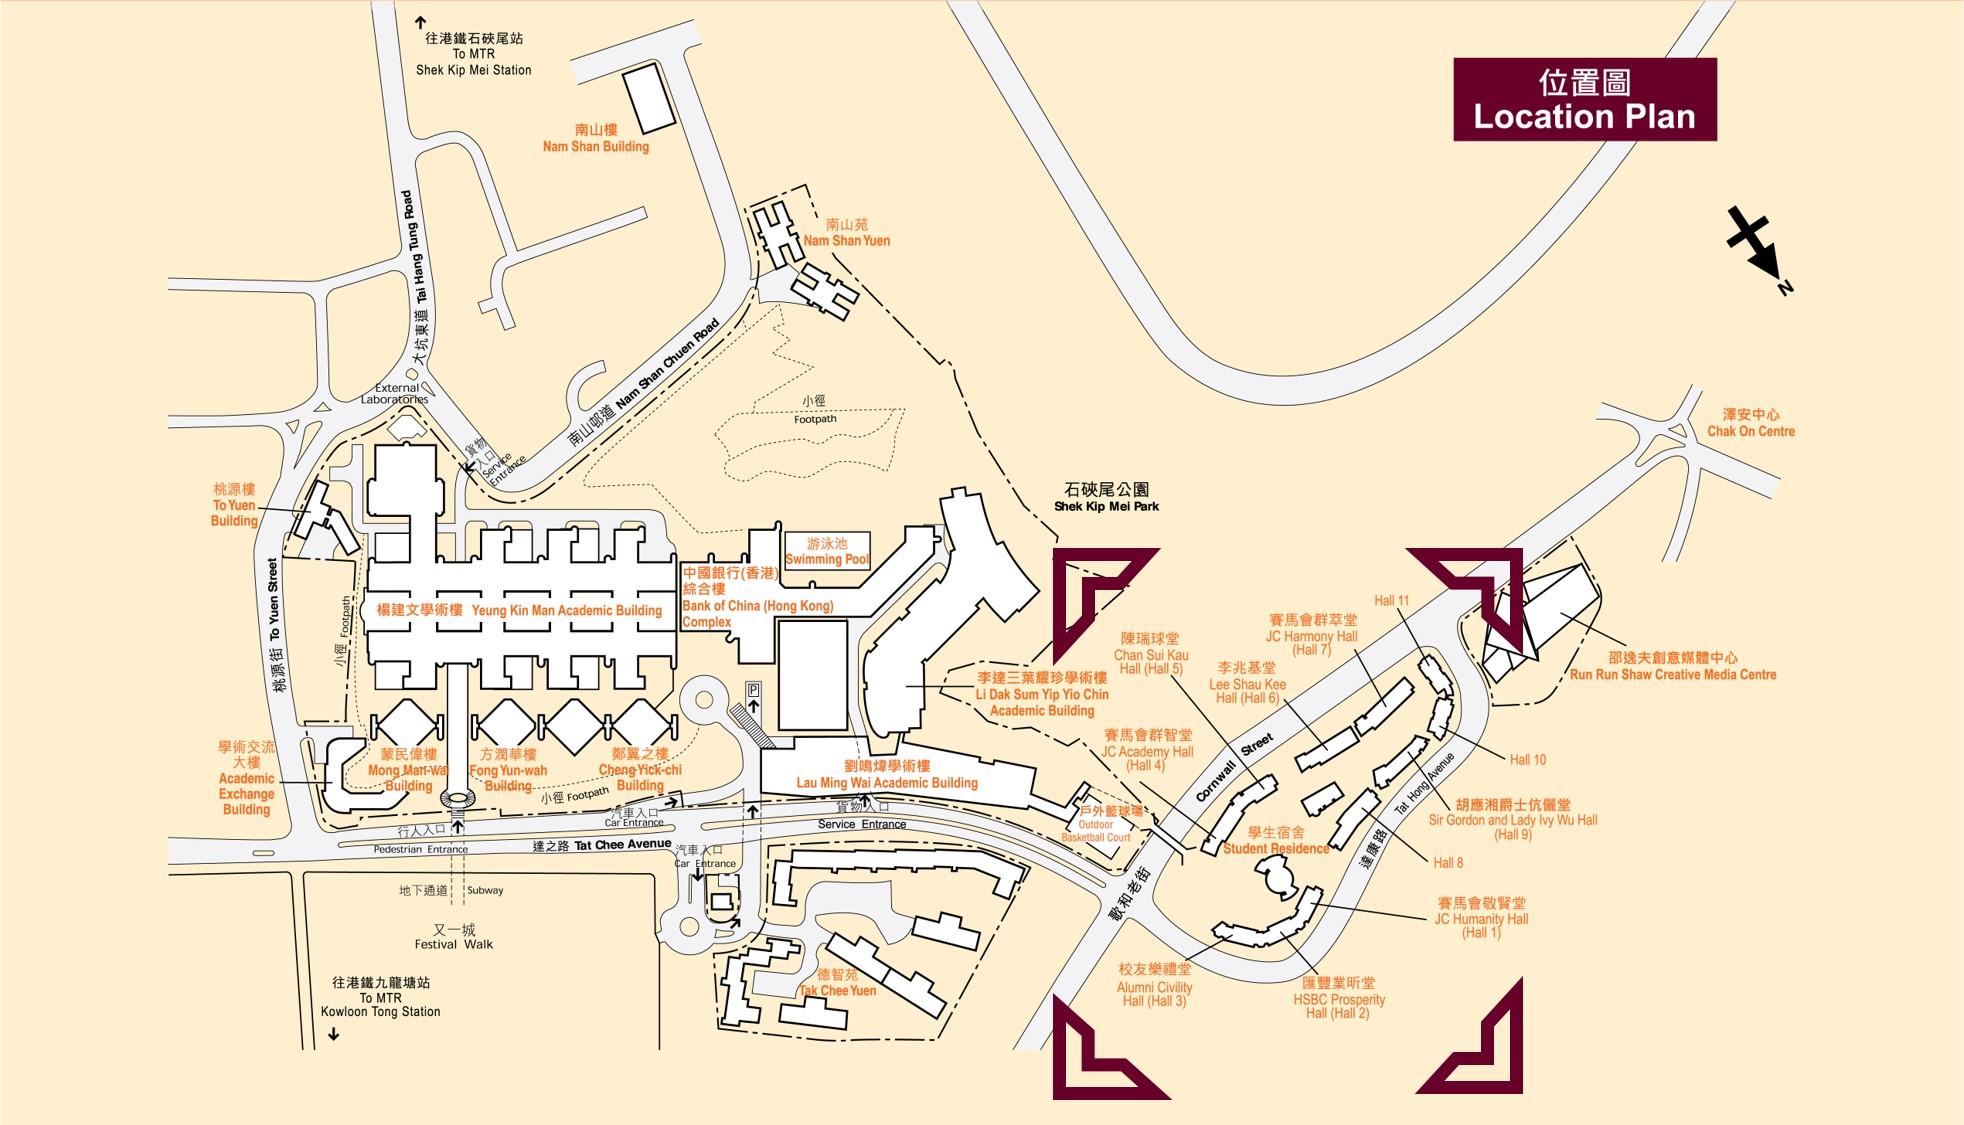 Student Residence Office - City University of Hong Kong